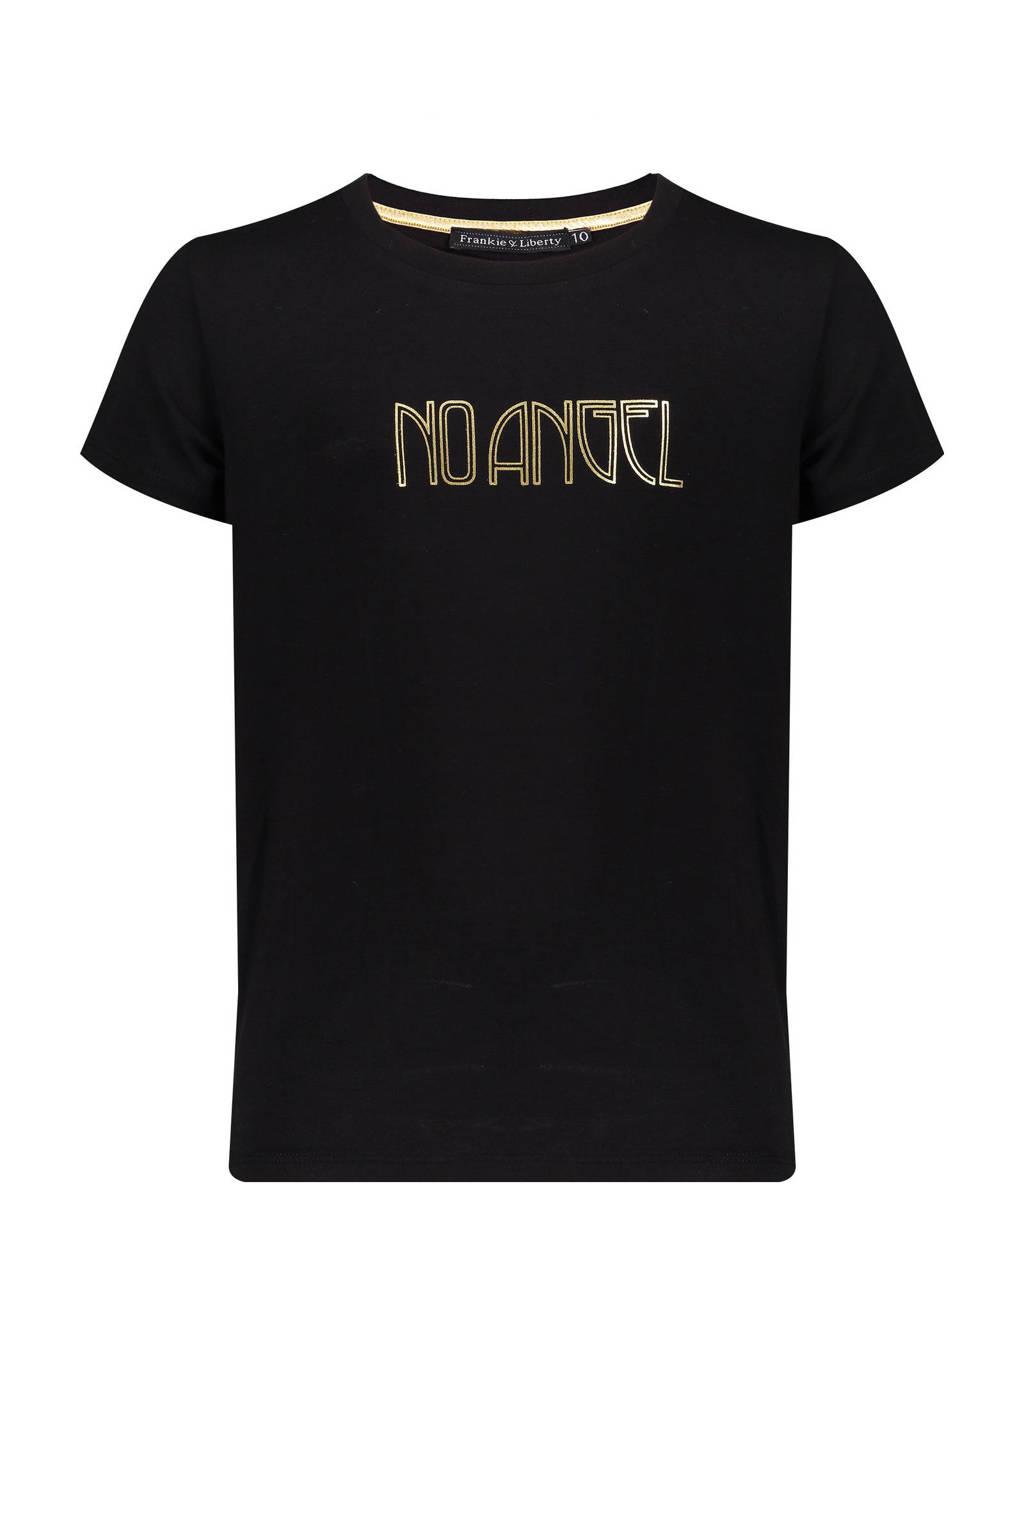 Frankie&Liberty T-shirt Stine met printopdruk zwart/goud, Zwart/goud